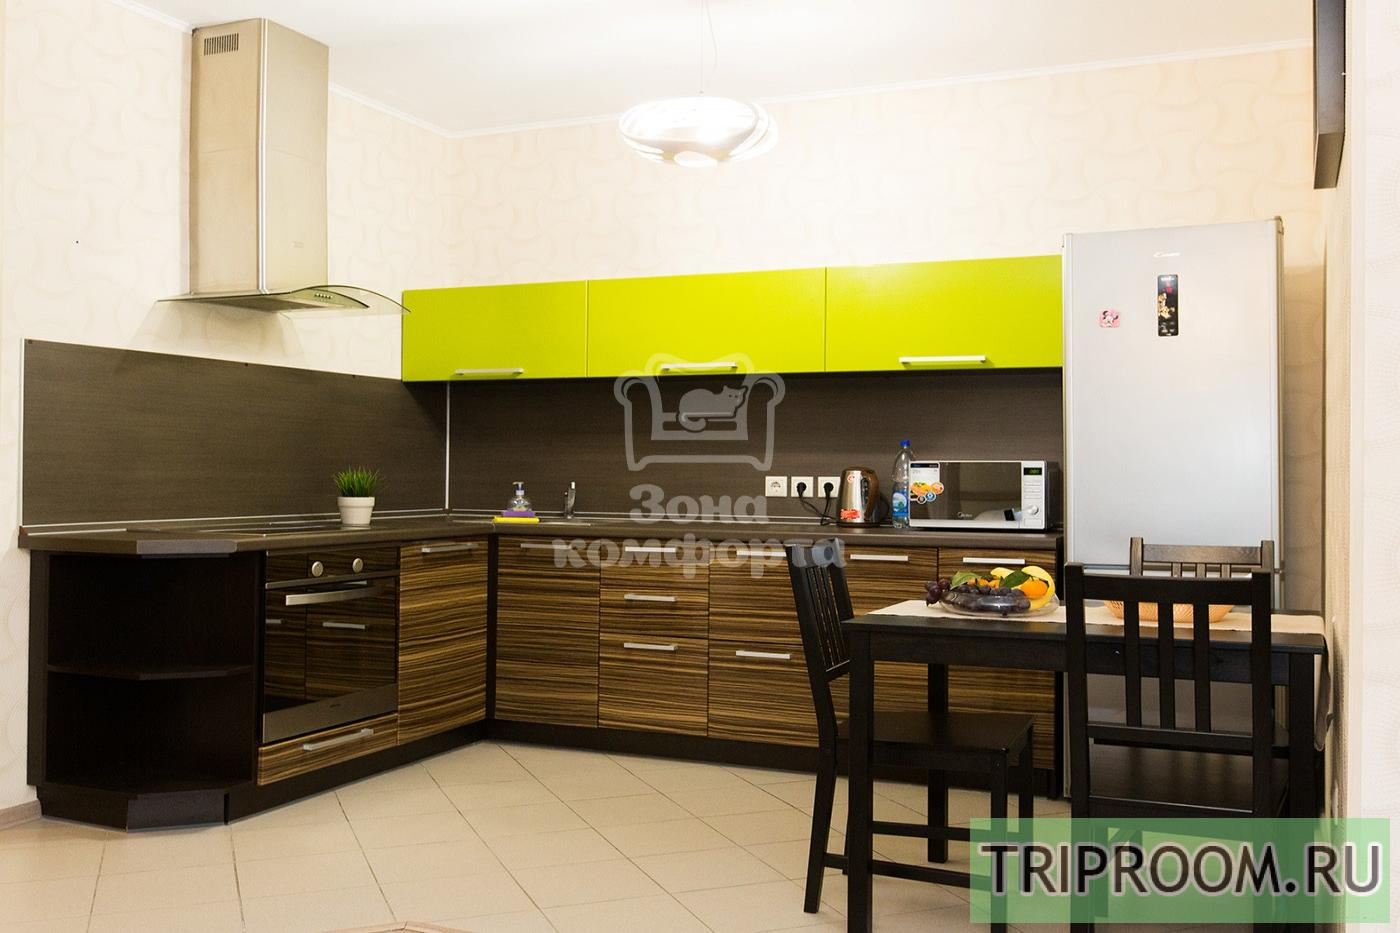 2-комнатная квартира посуточно (вариант № 34715), ул. Гагарина бульвар, фото № 11